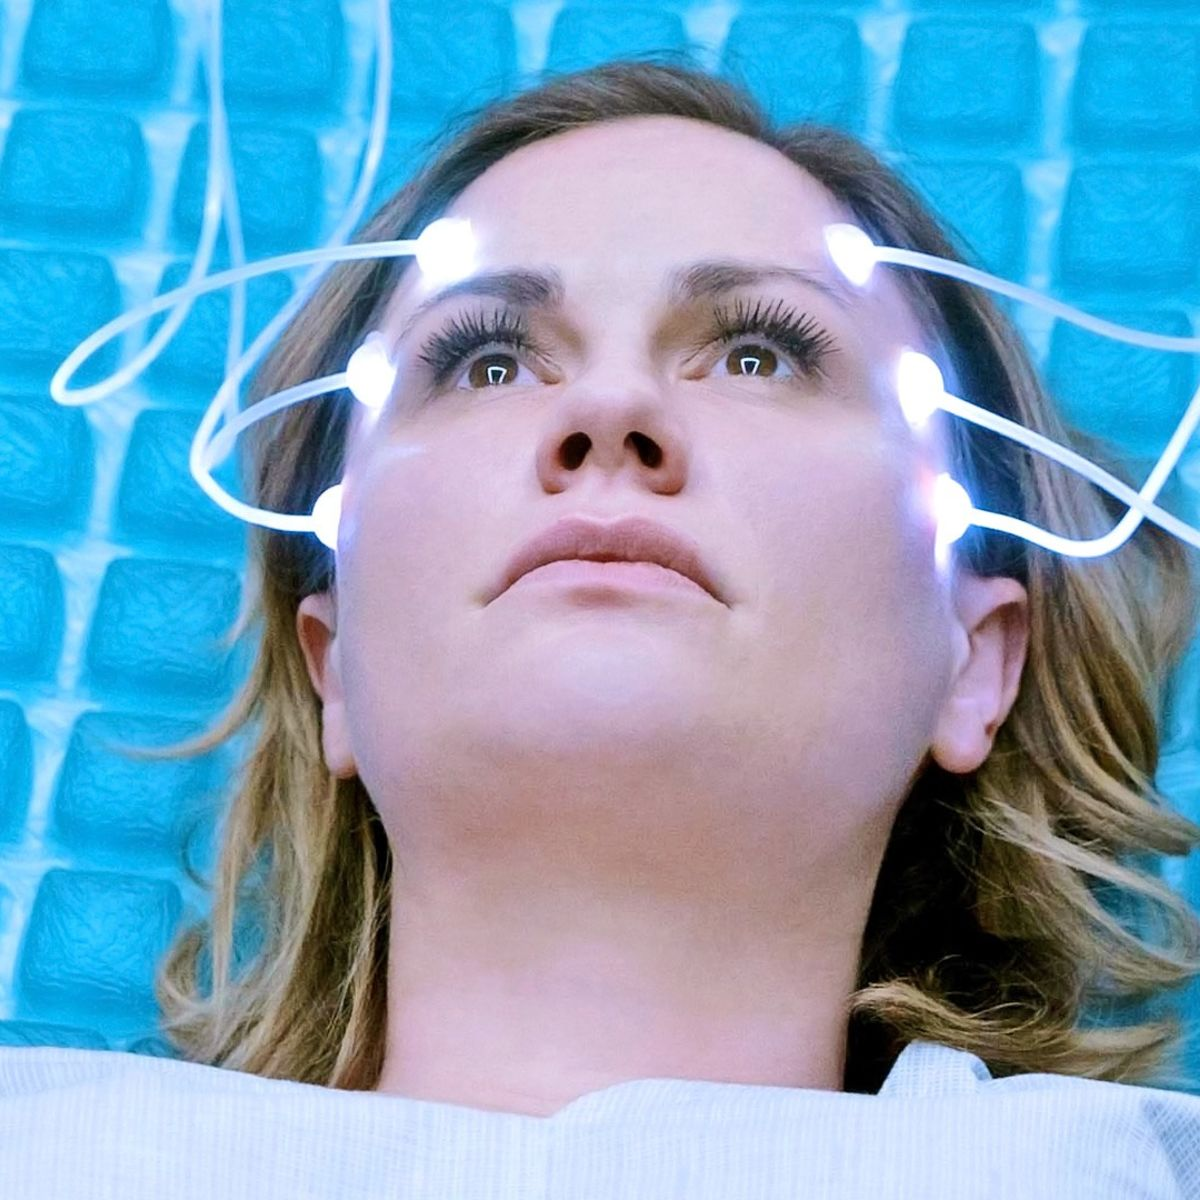 philip-k-dick-s-electric-dreams Anna Paquin.jpg